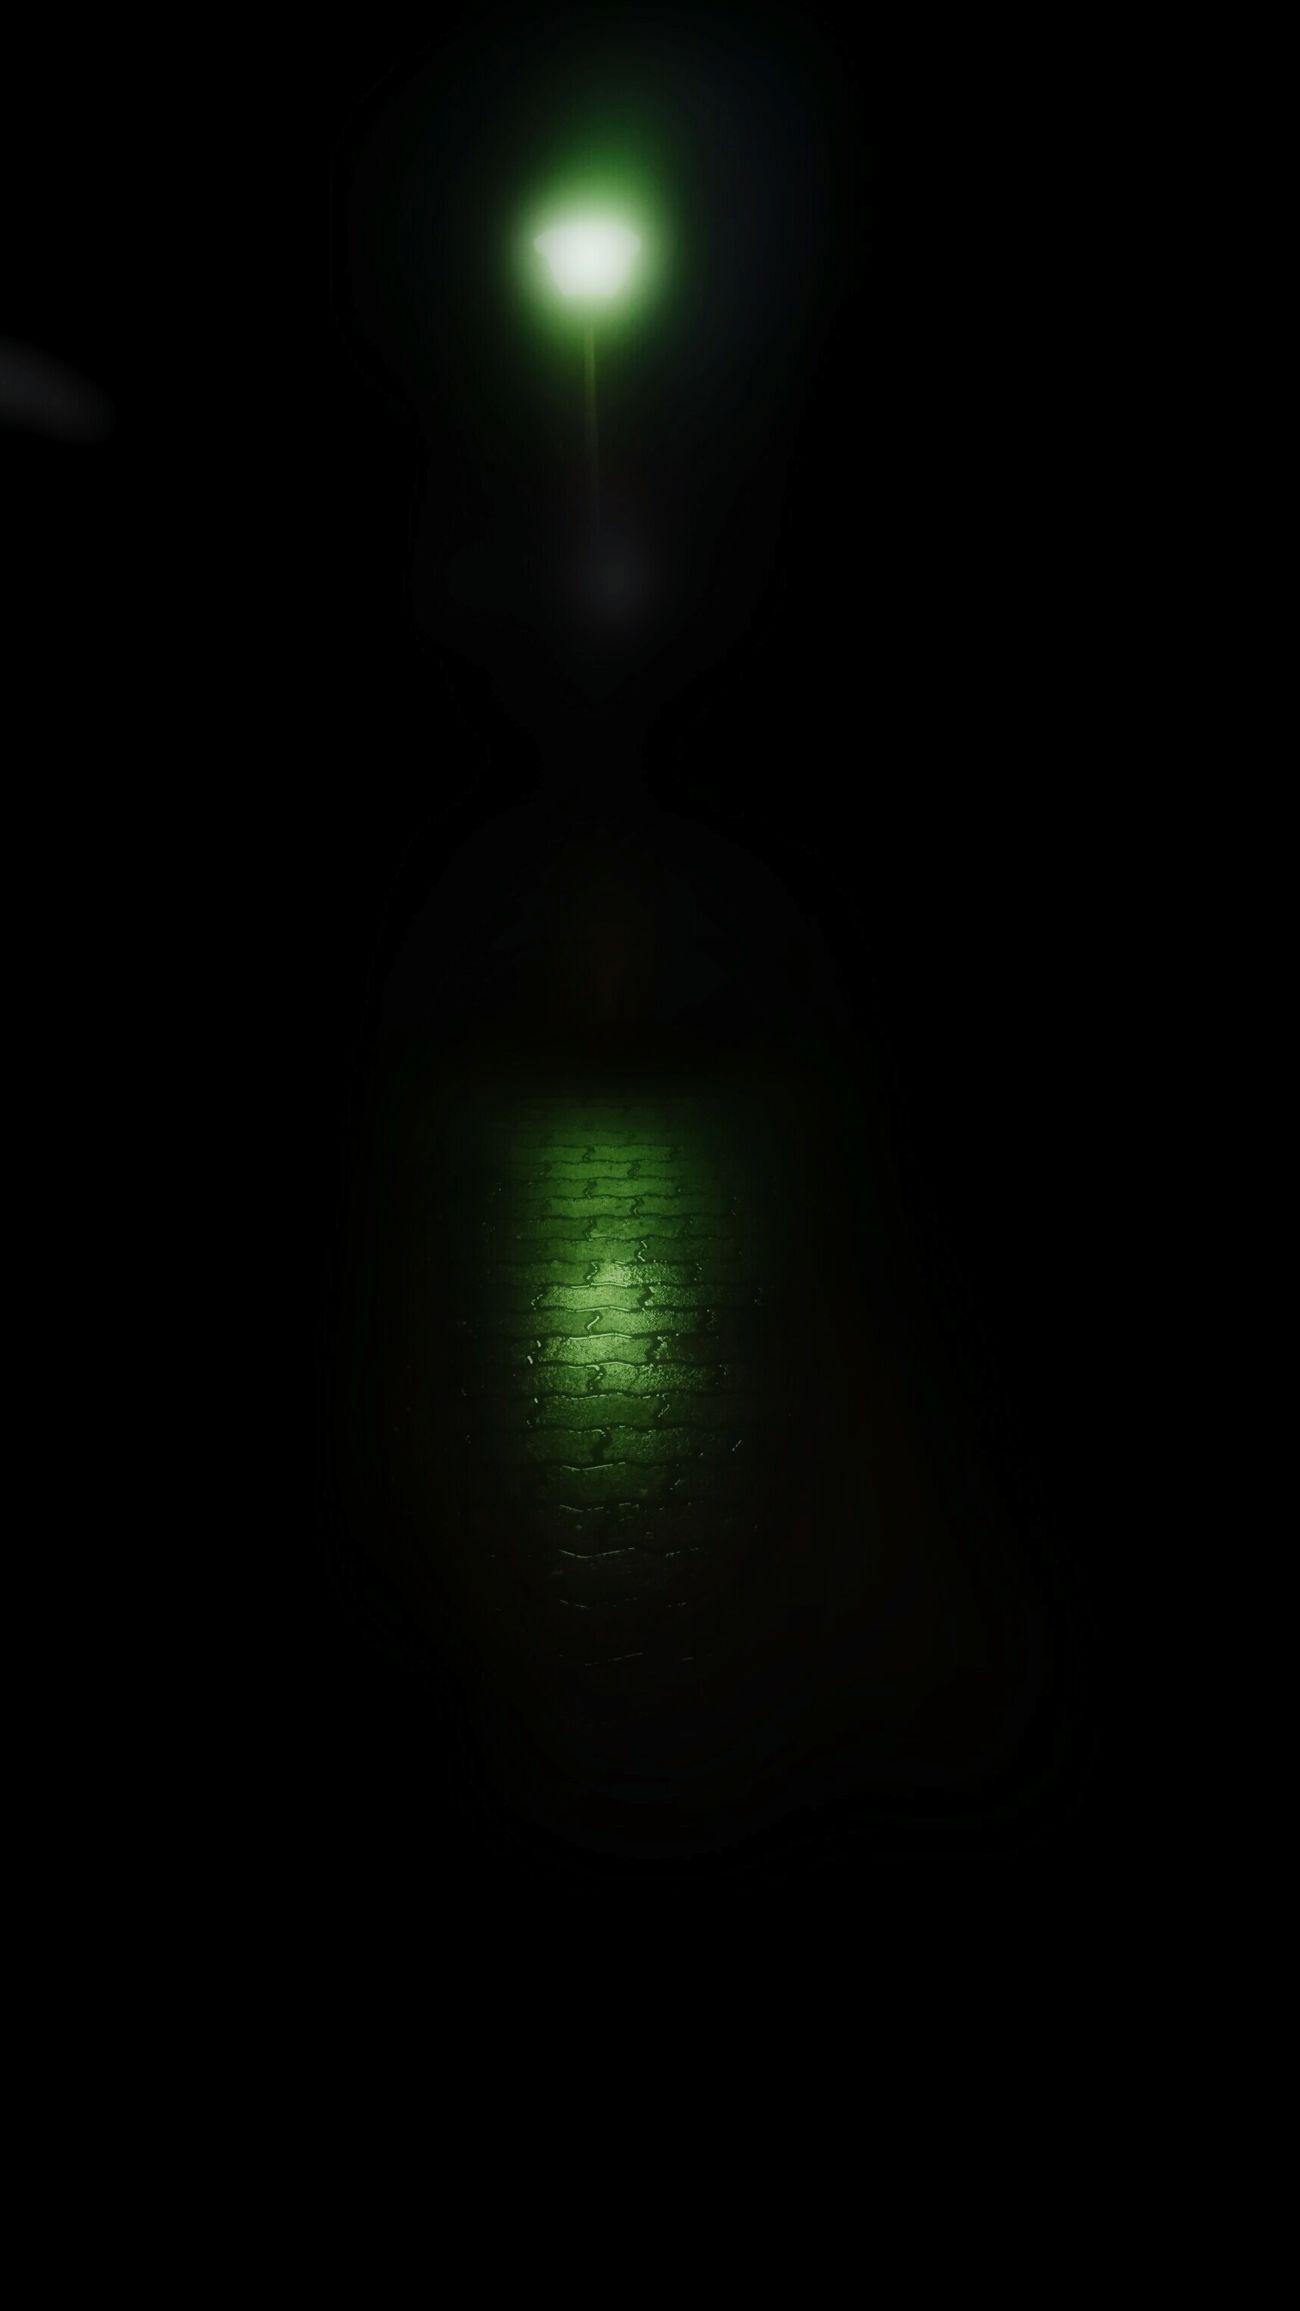 Black&Light... cd Green Lantern  Night Shadow Black & White Darckphoto Darck Night Lights Nightphotography Darkness And Light Gorzów Wielkopolski Poland